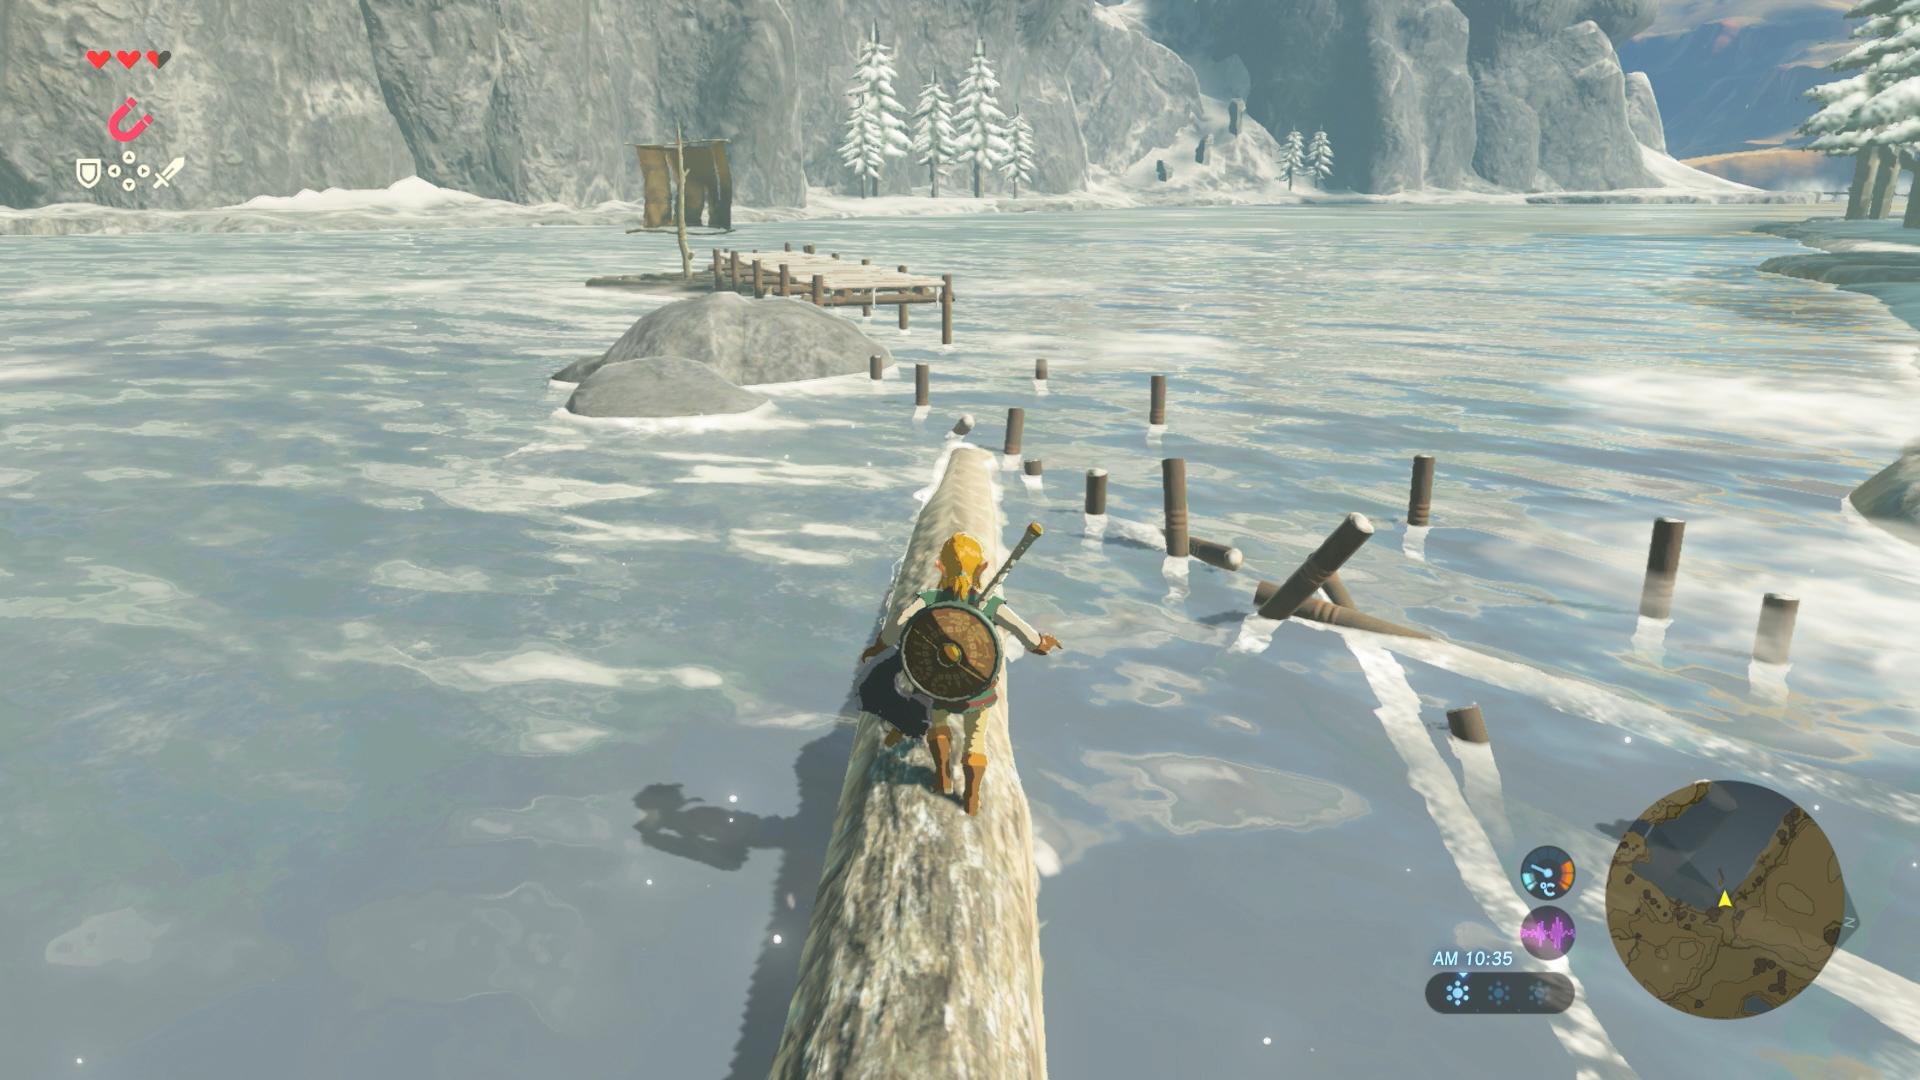 Nové screenshoty z The Legend of Zelda: Breath of the Wild 139313